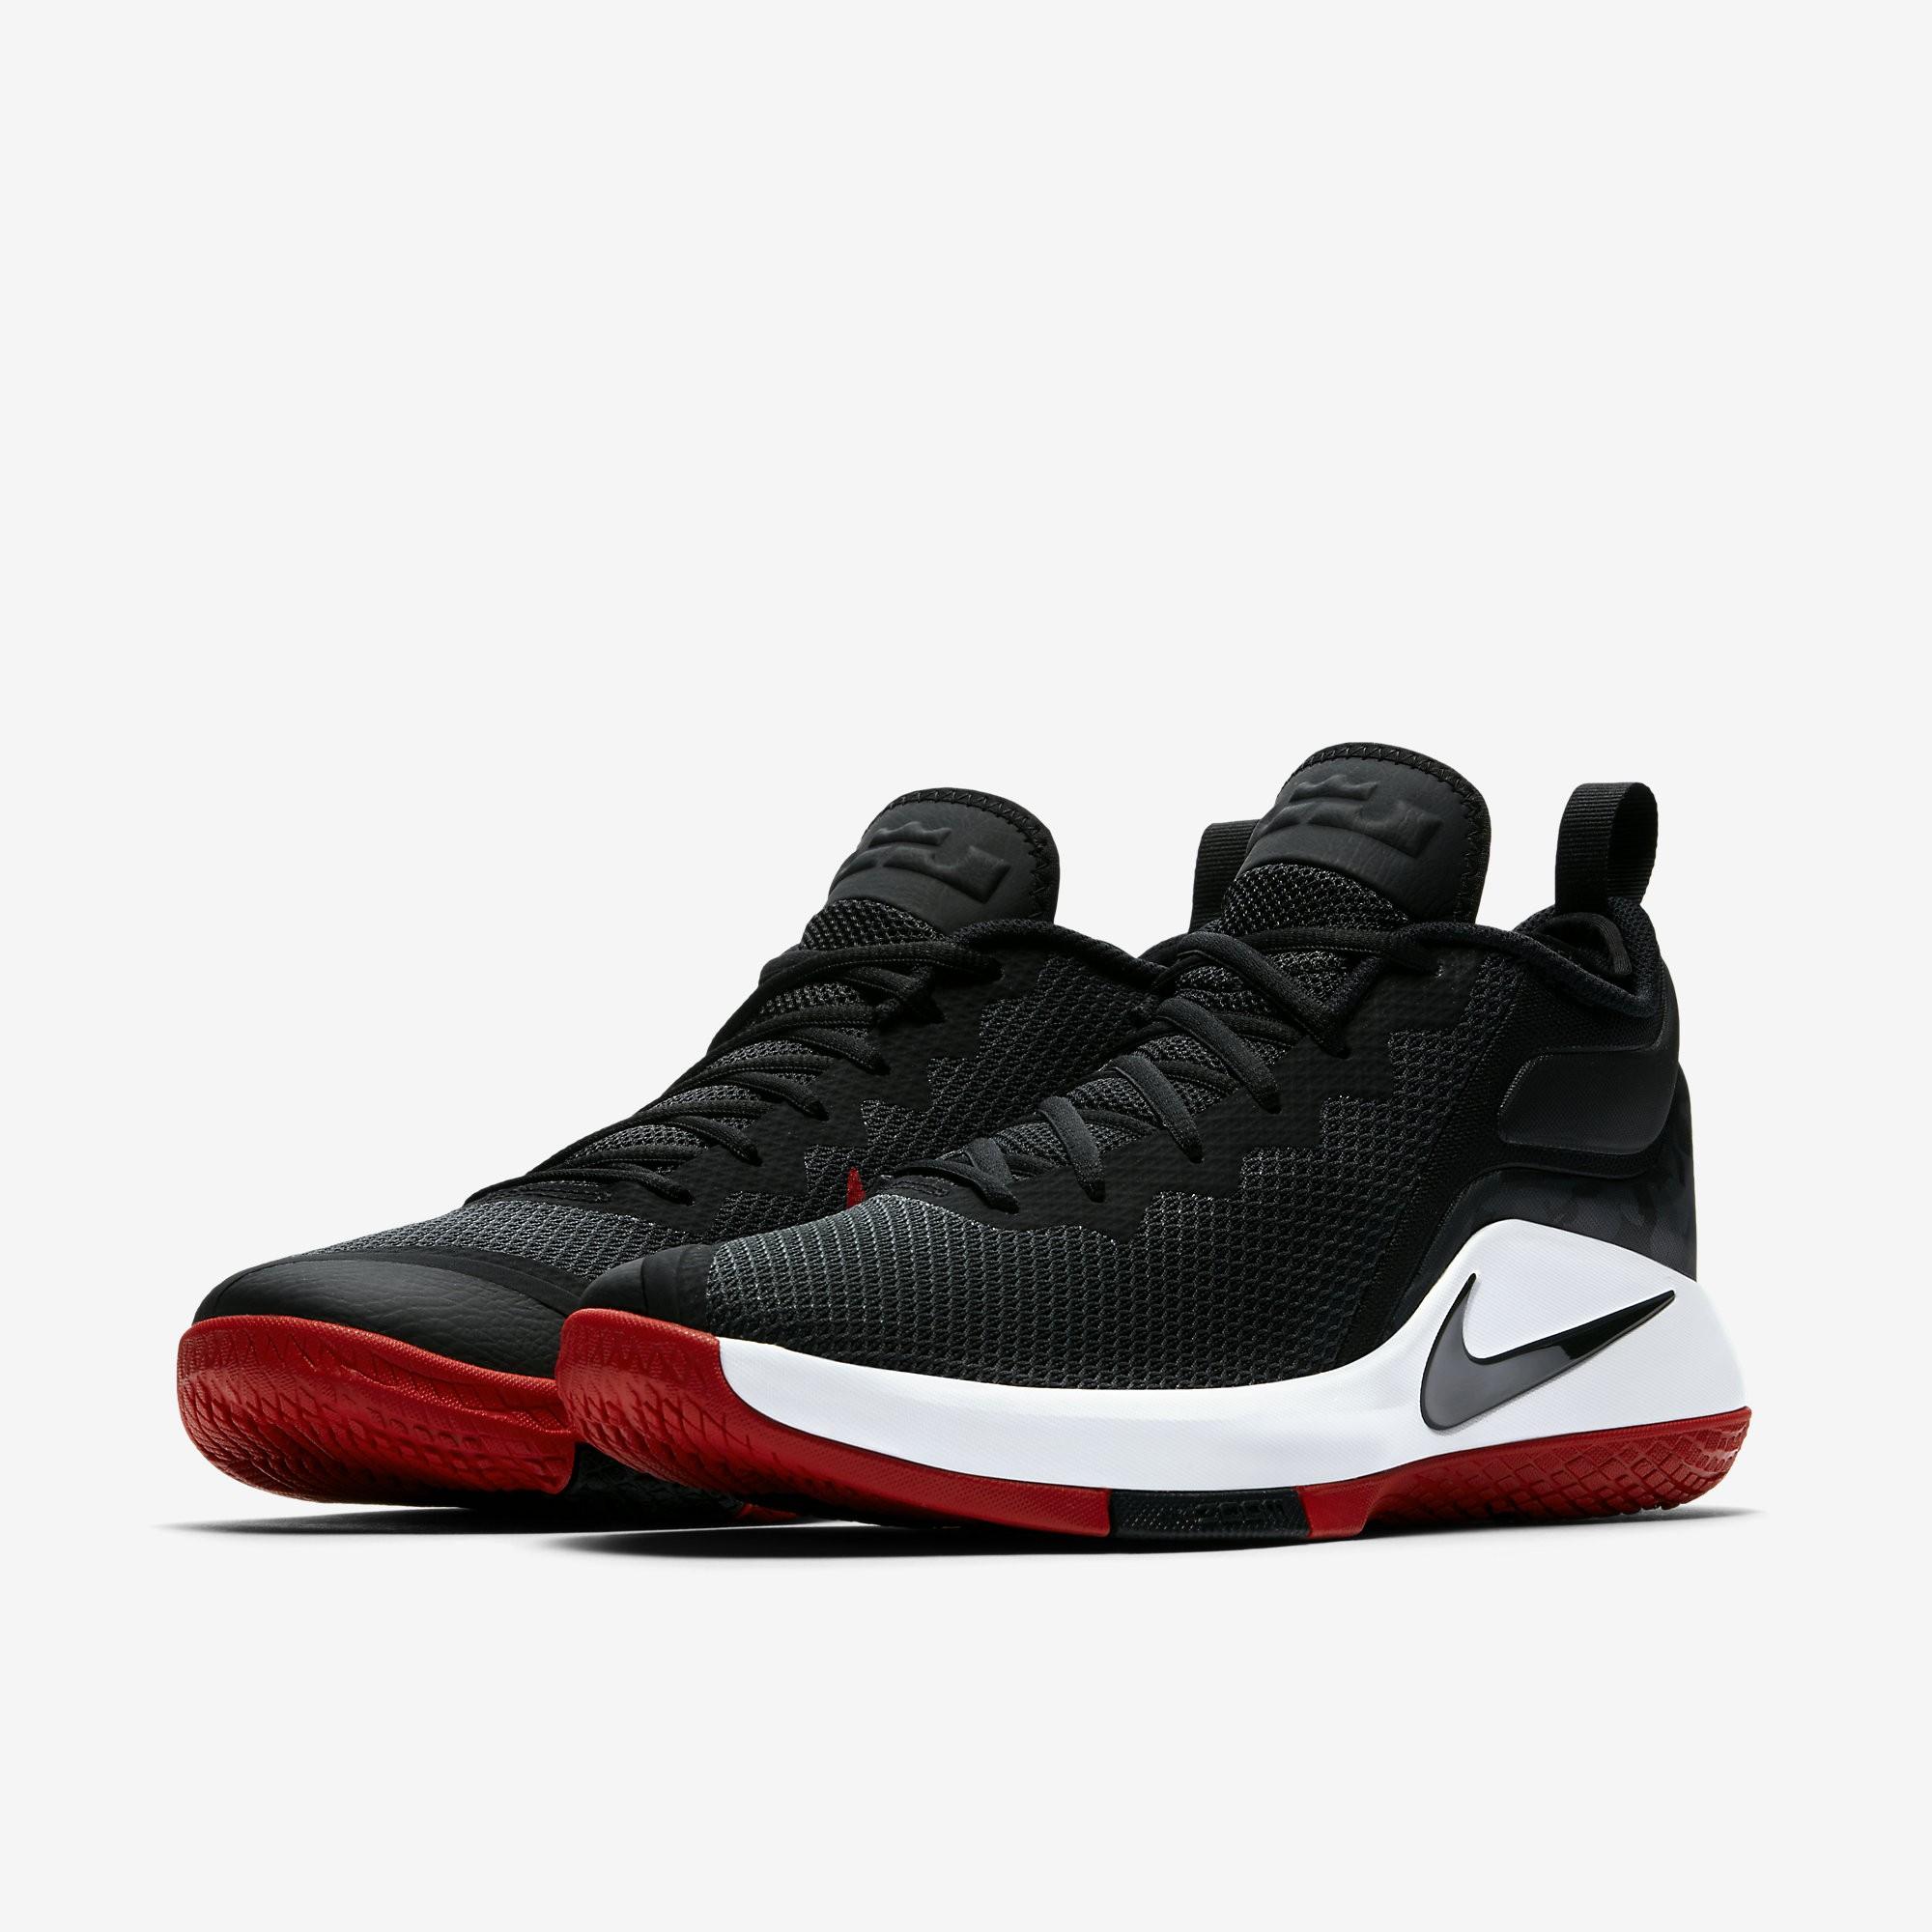 b8844d0ba1840 Zapatillas Baloncesto Nike Zoom LeBron Witness II 942518 006 - Deportes  Manzanedo